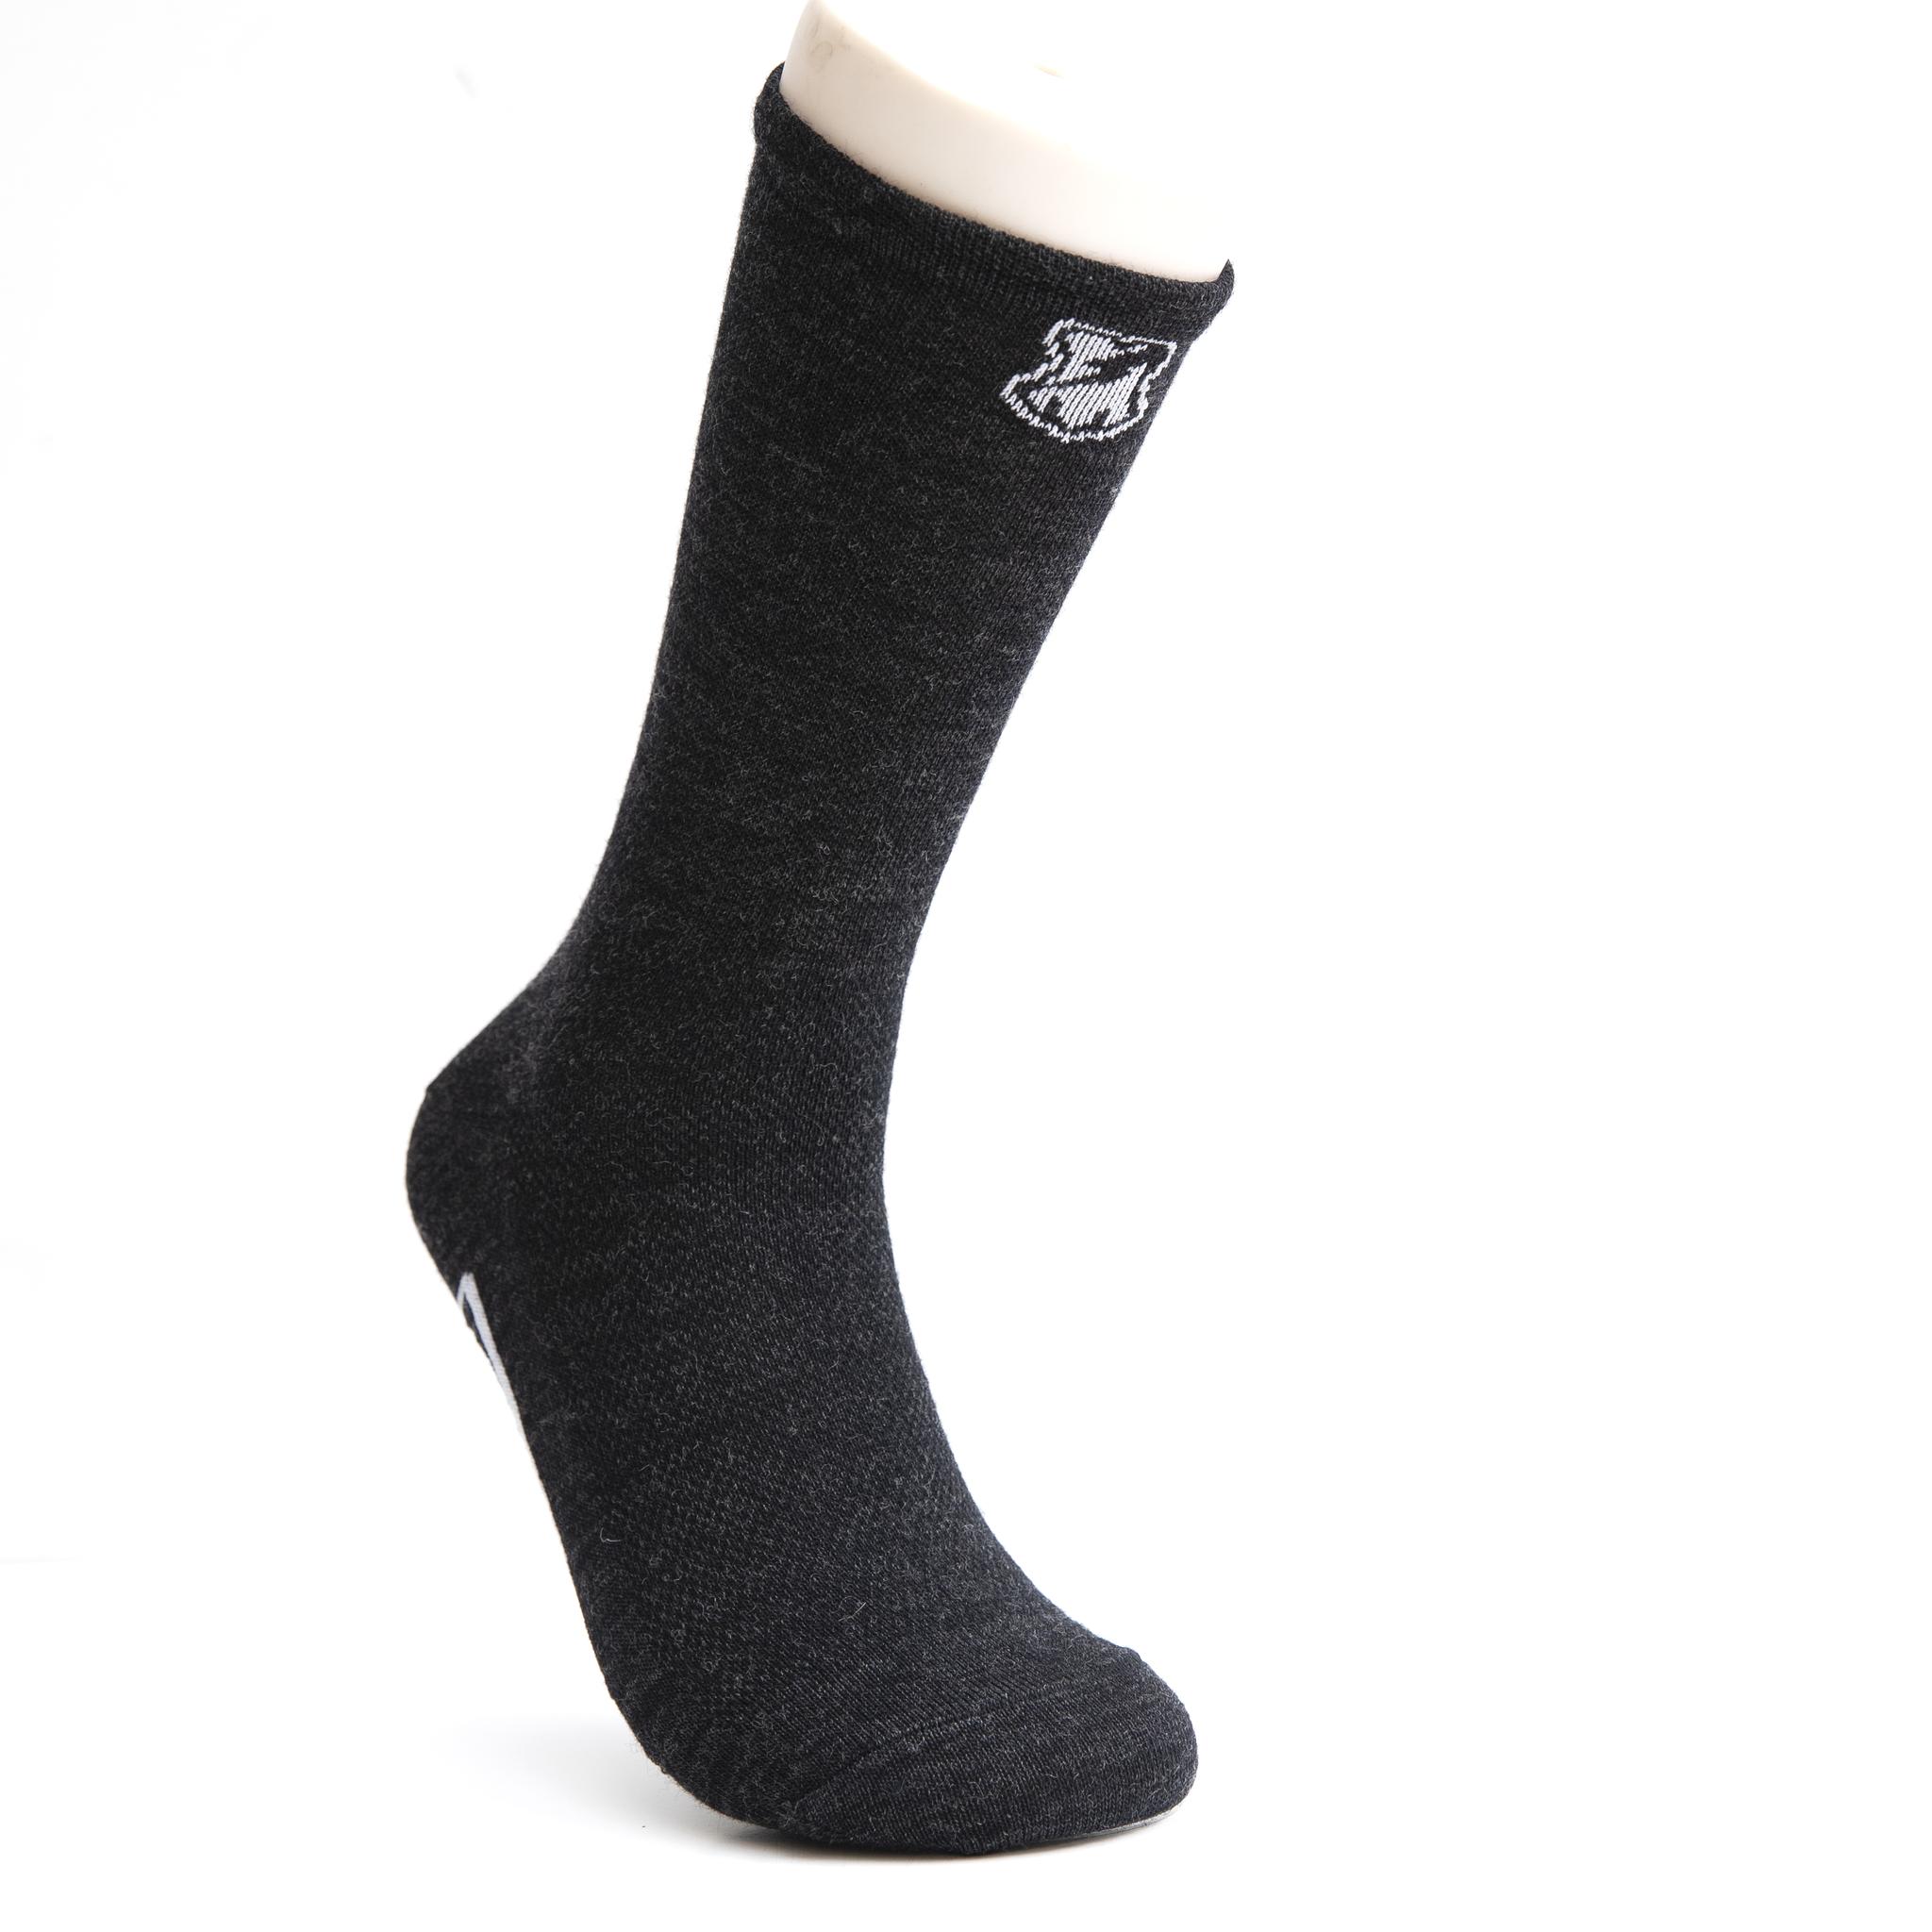 MASH California Wool High Sock